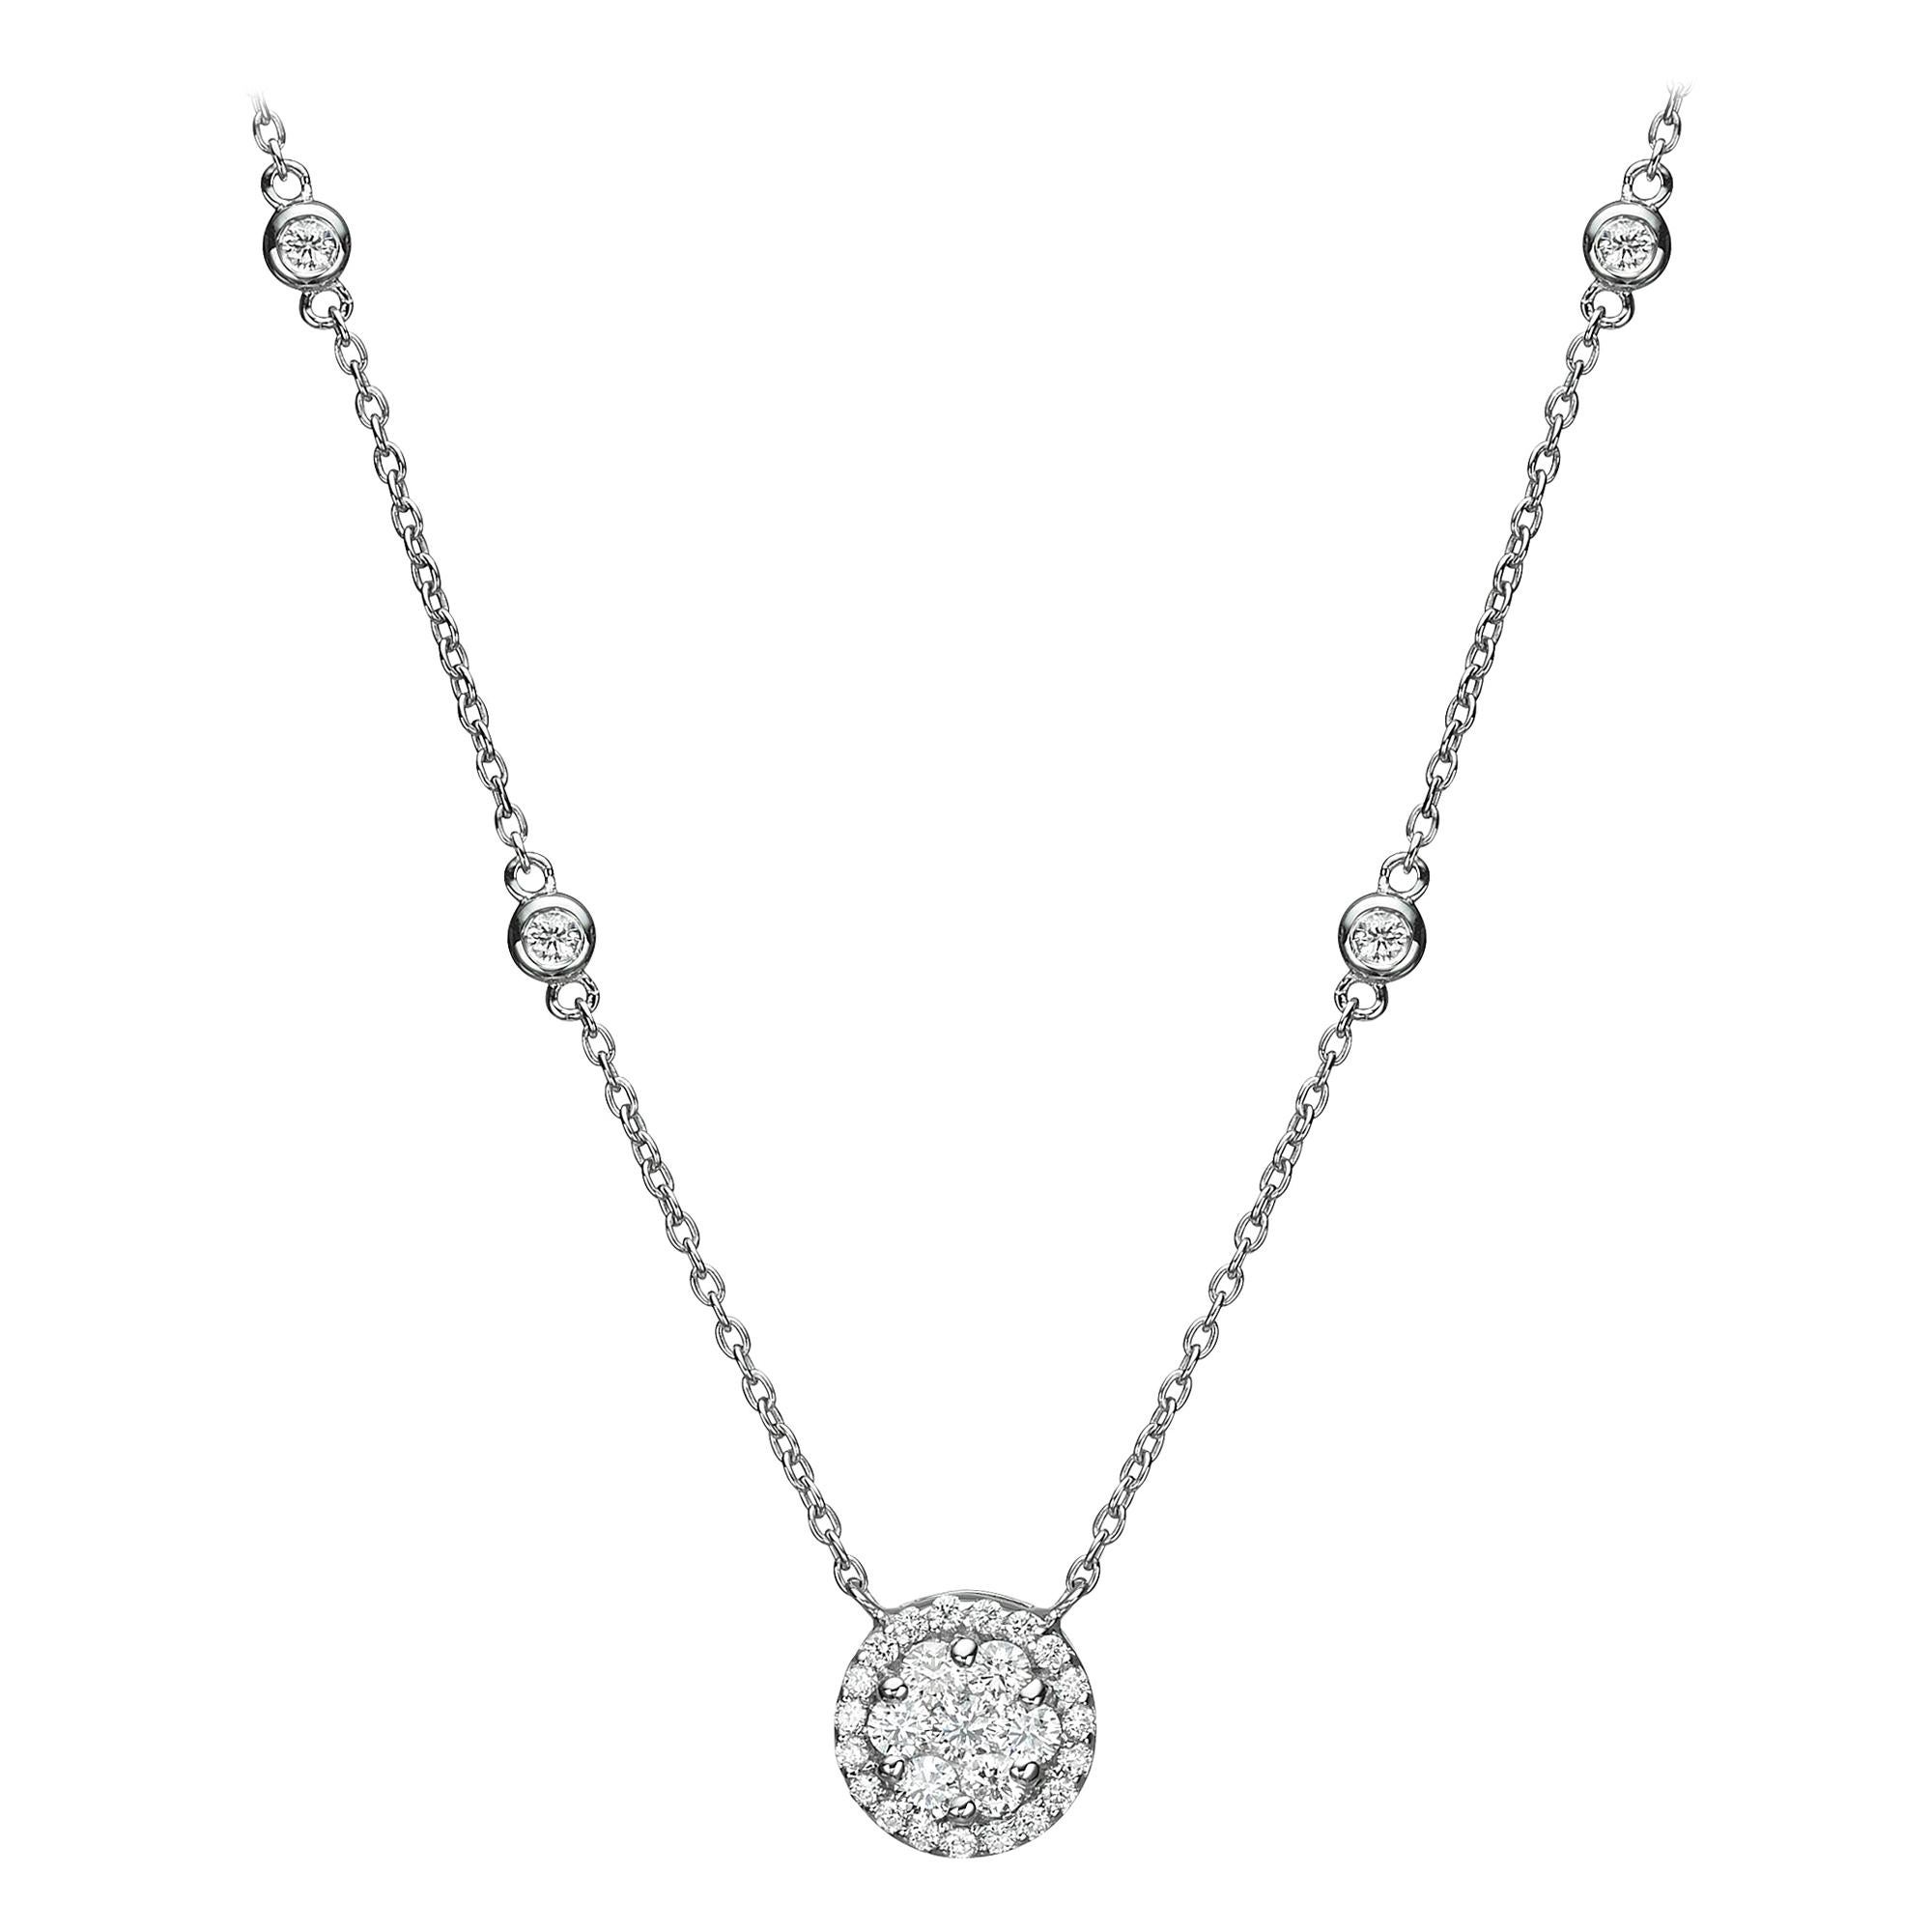 18 Karat Gold, 0.69 Carat, F Color, VS Clarity, Diamond Crusted Flower Pendant